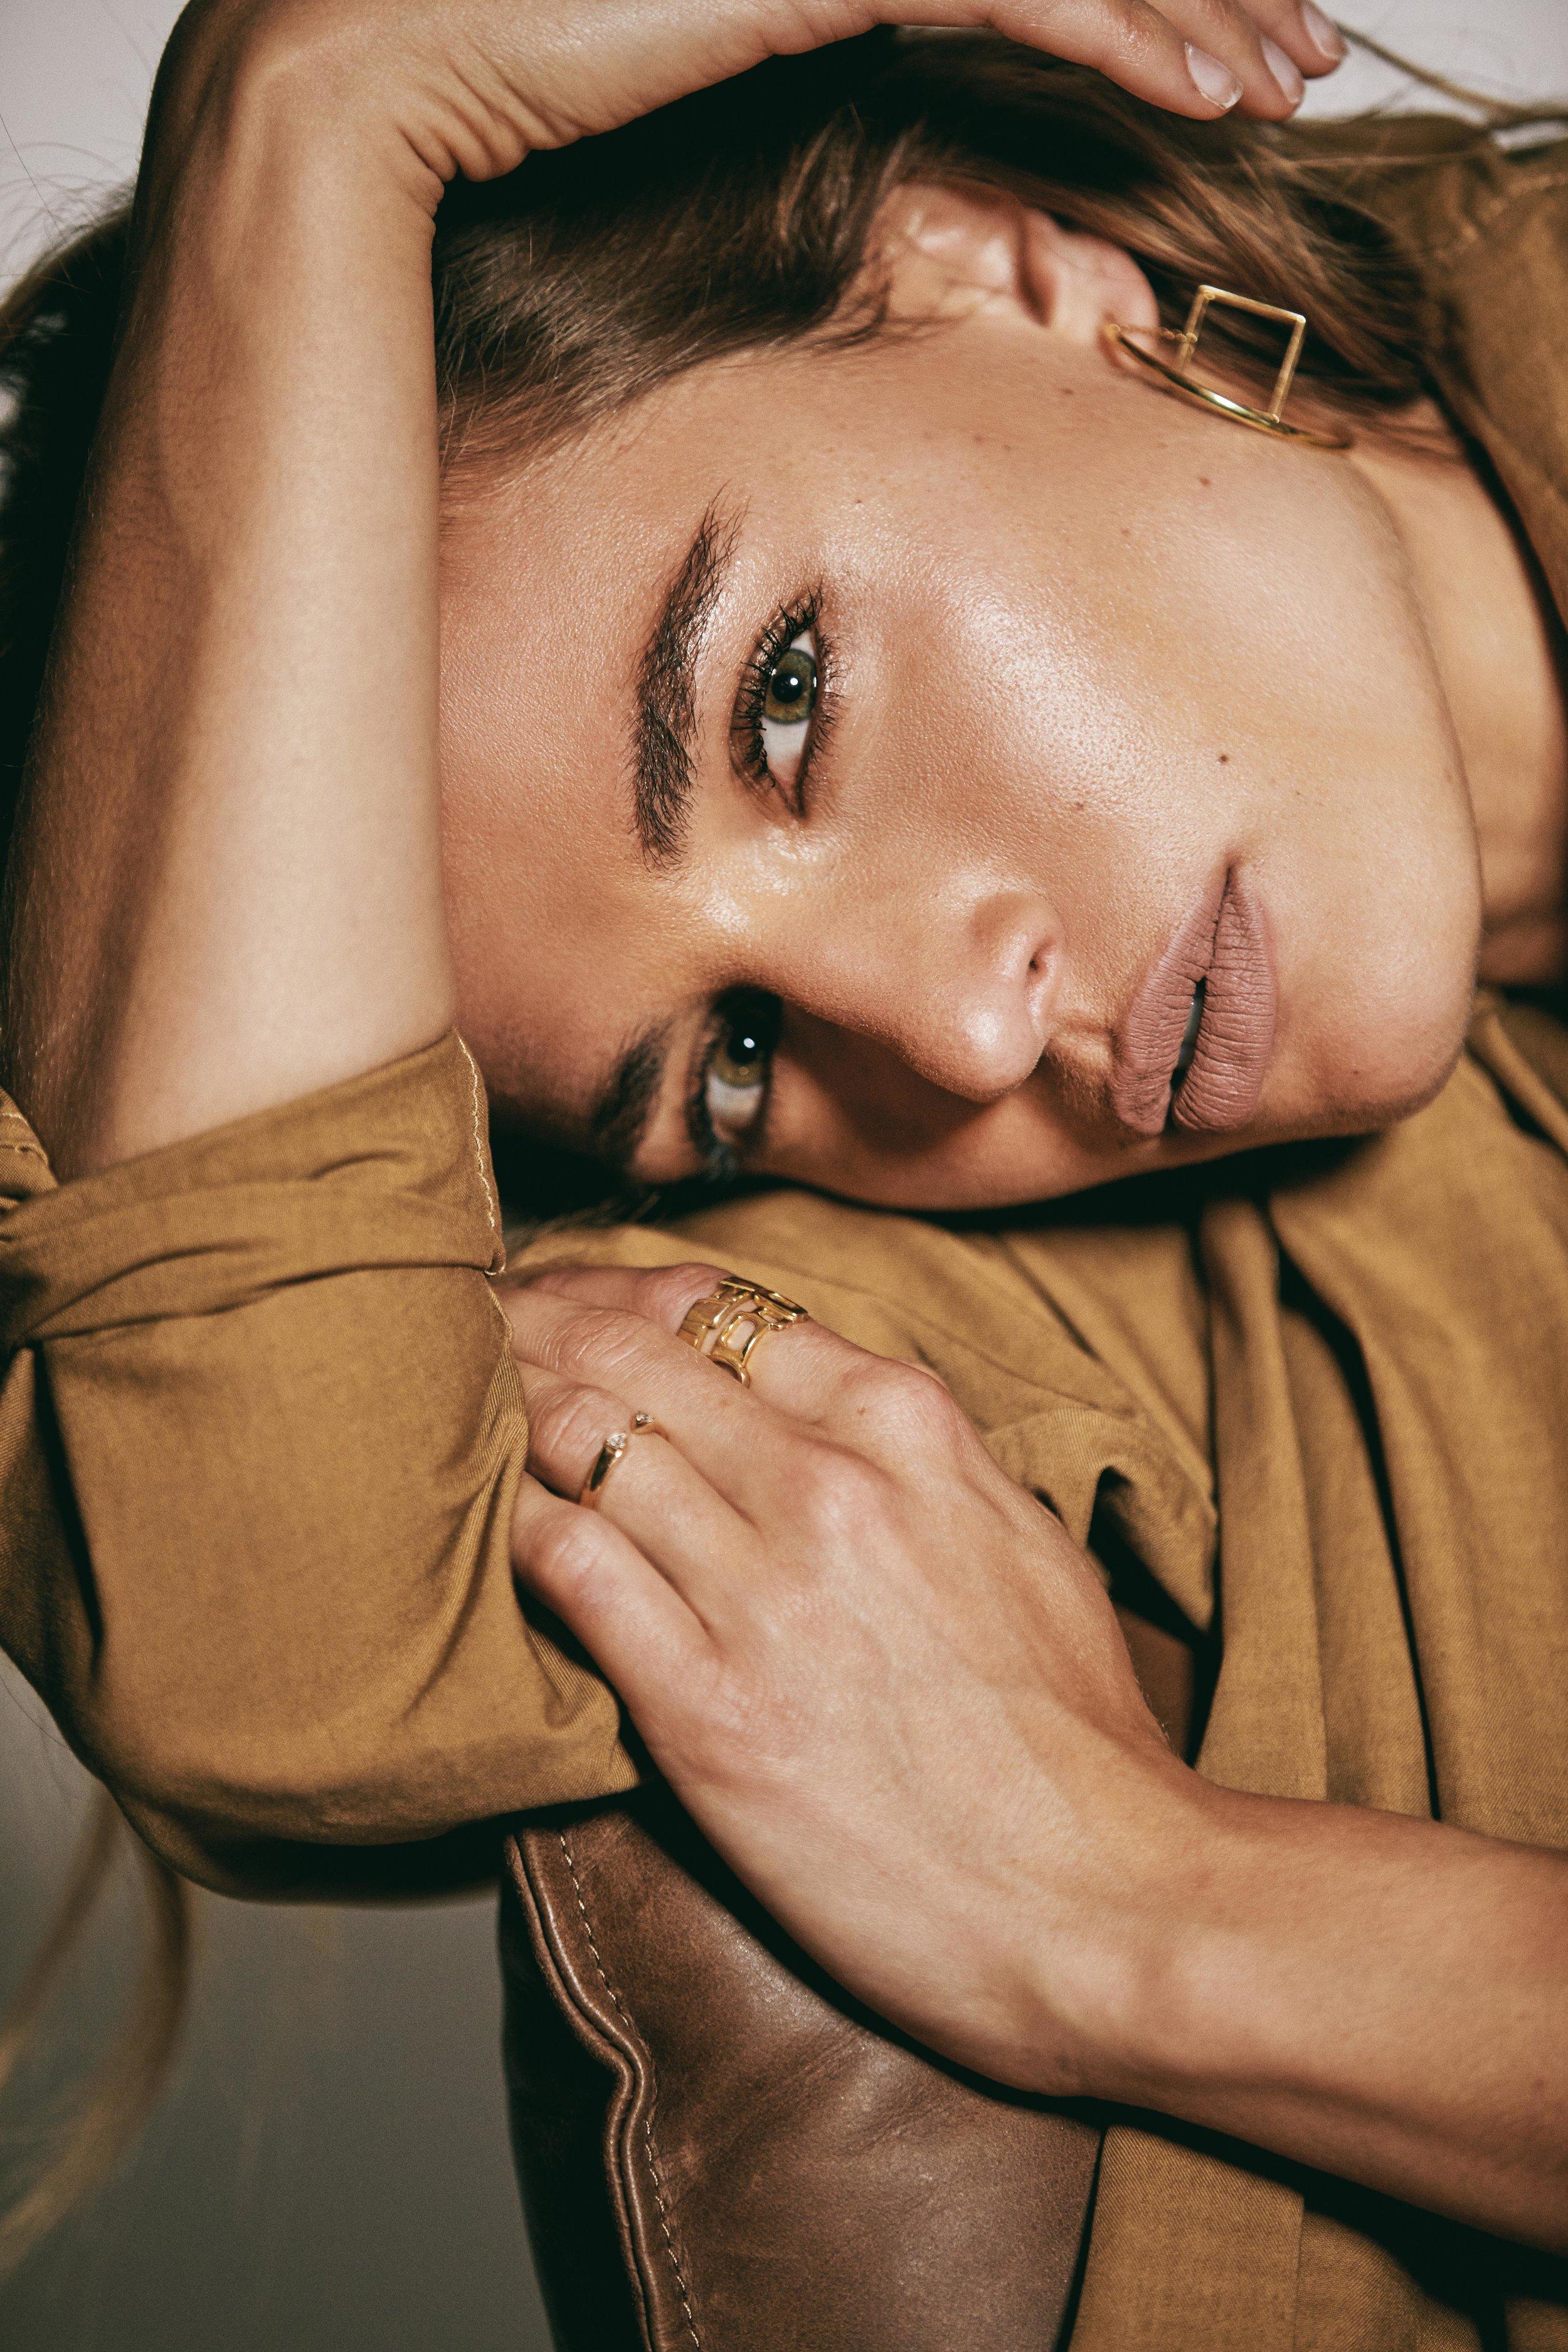 Earrings by Pina Studio; Rings by Pina Studio; Ring by Shahla Karimi